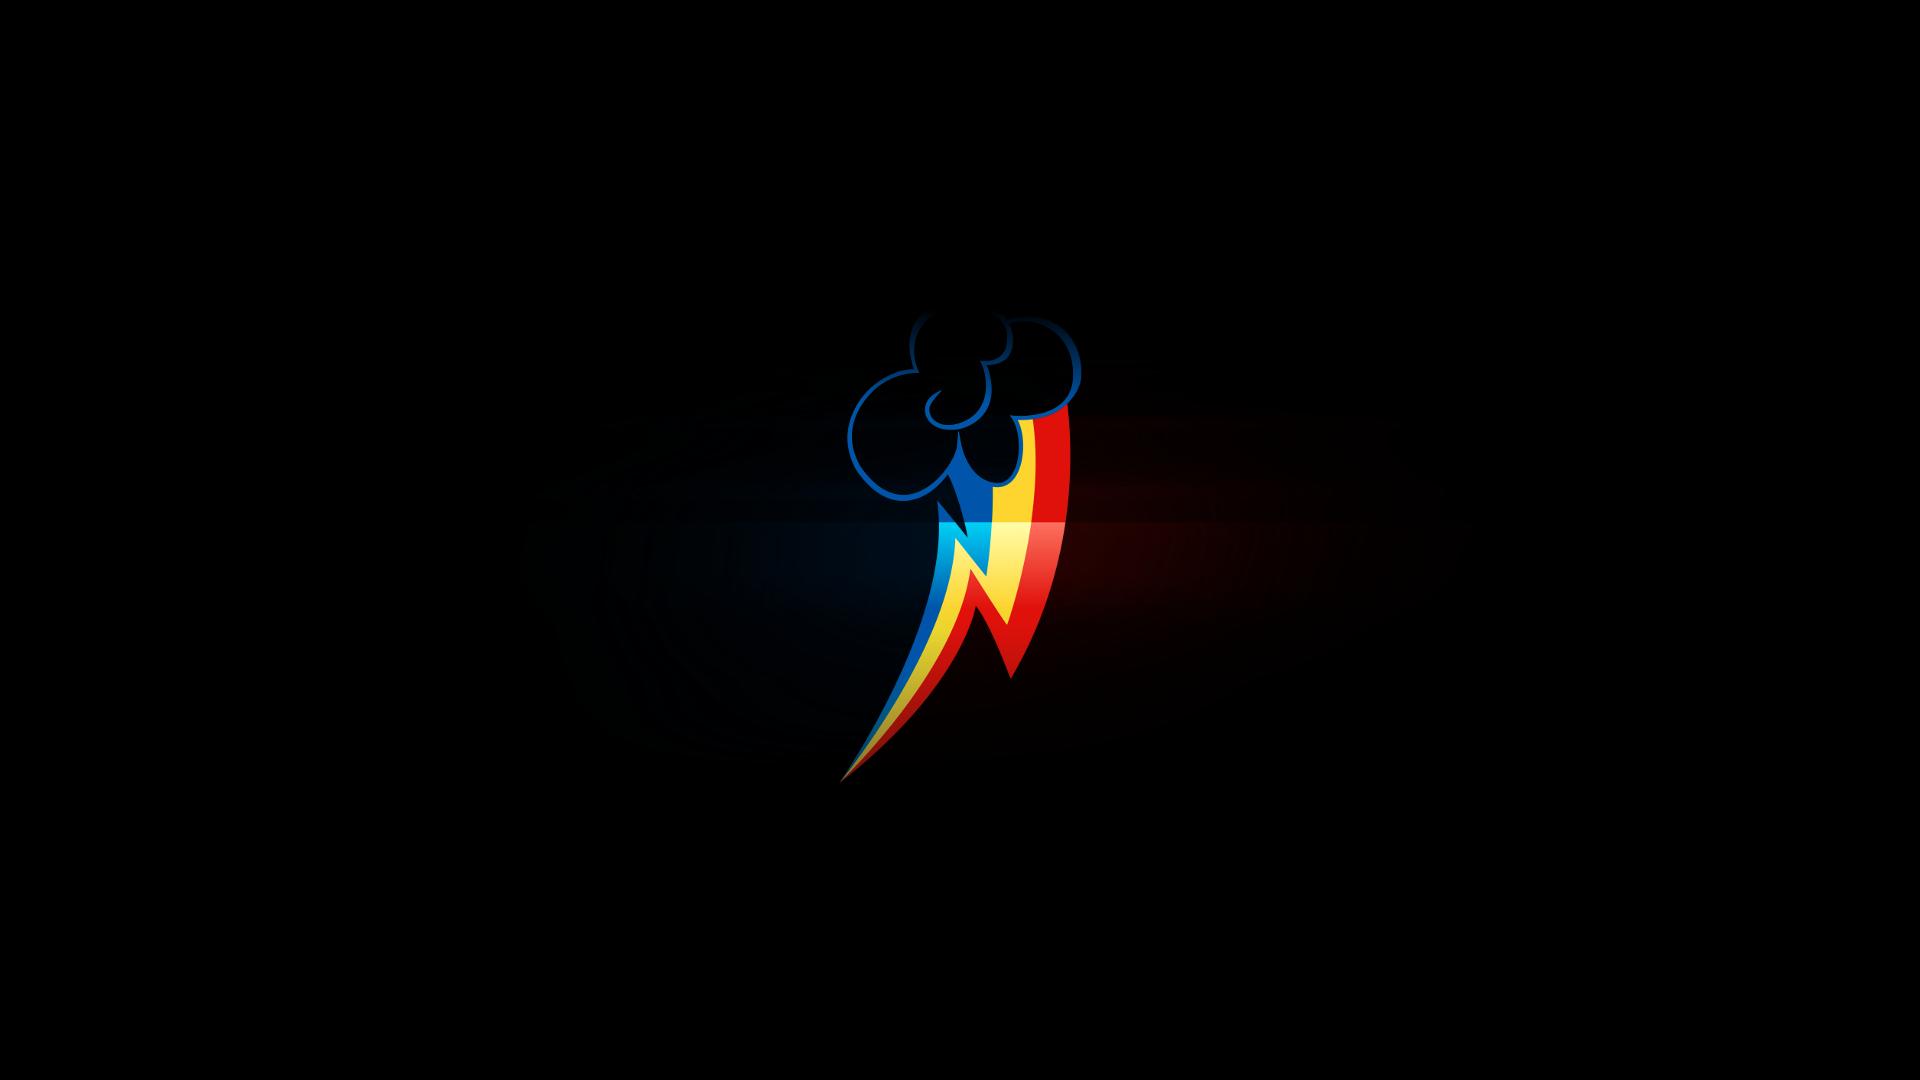 Free Download Black Minimalistic Dark My Little Pony Rainbow Dash